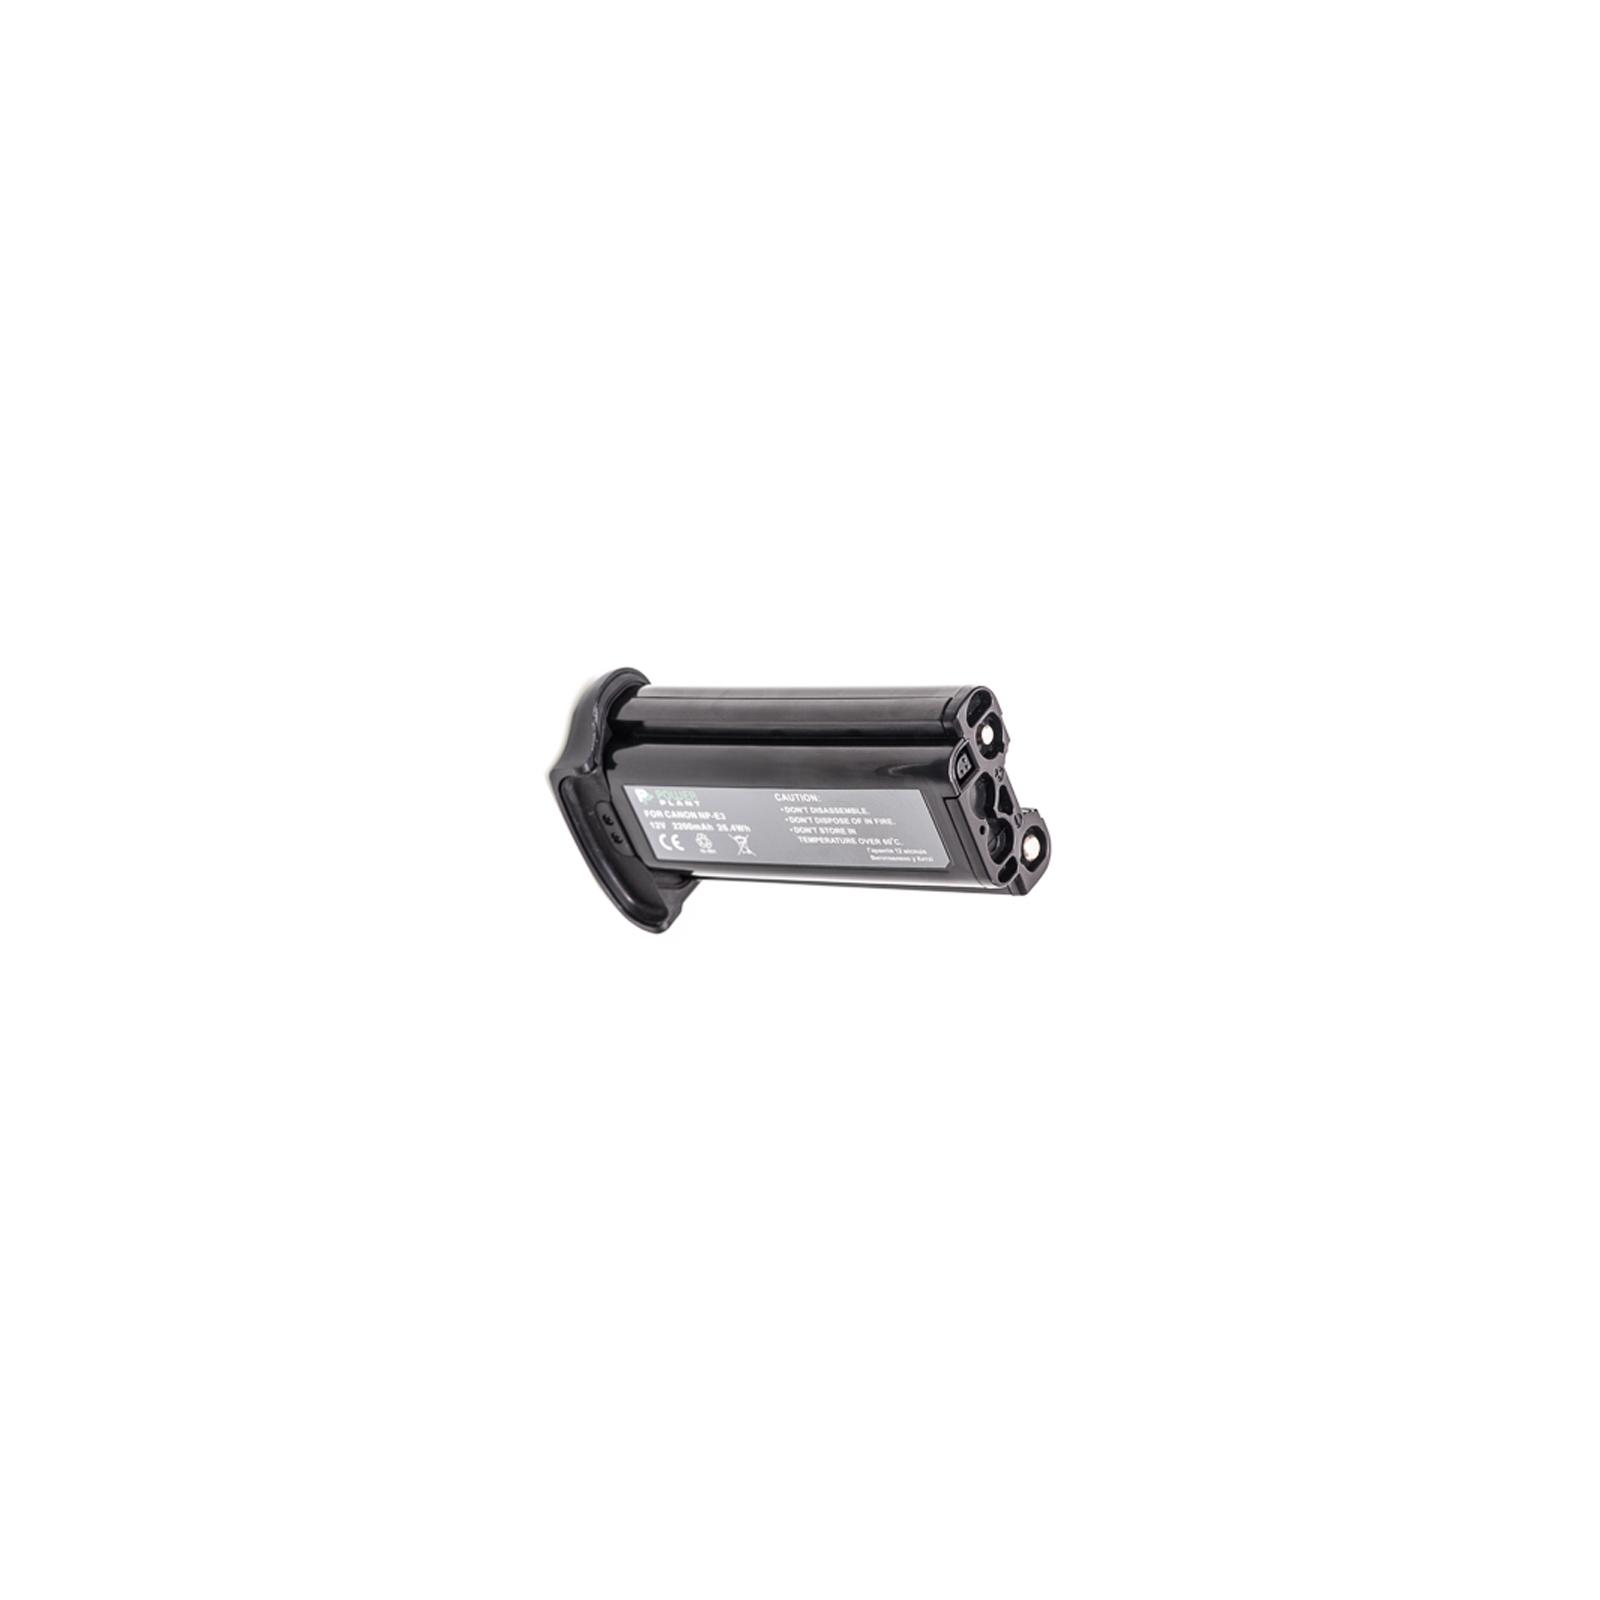 Аккумулятор к фото/видео PowerPlant Canon NP-E3 (DV00DV1019) изображение 2